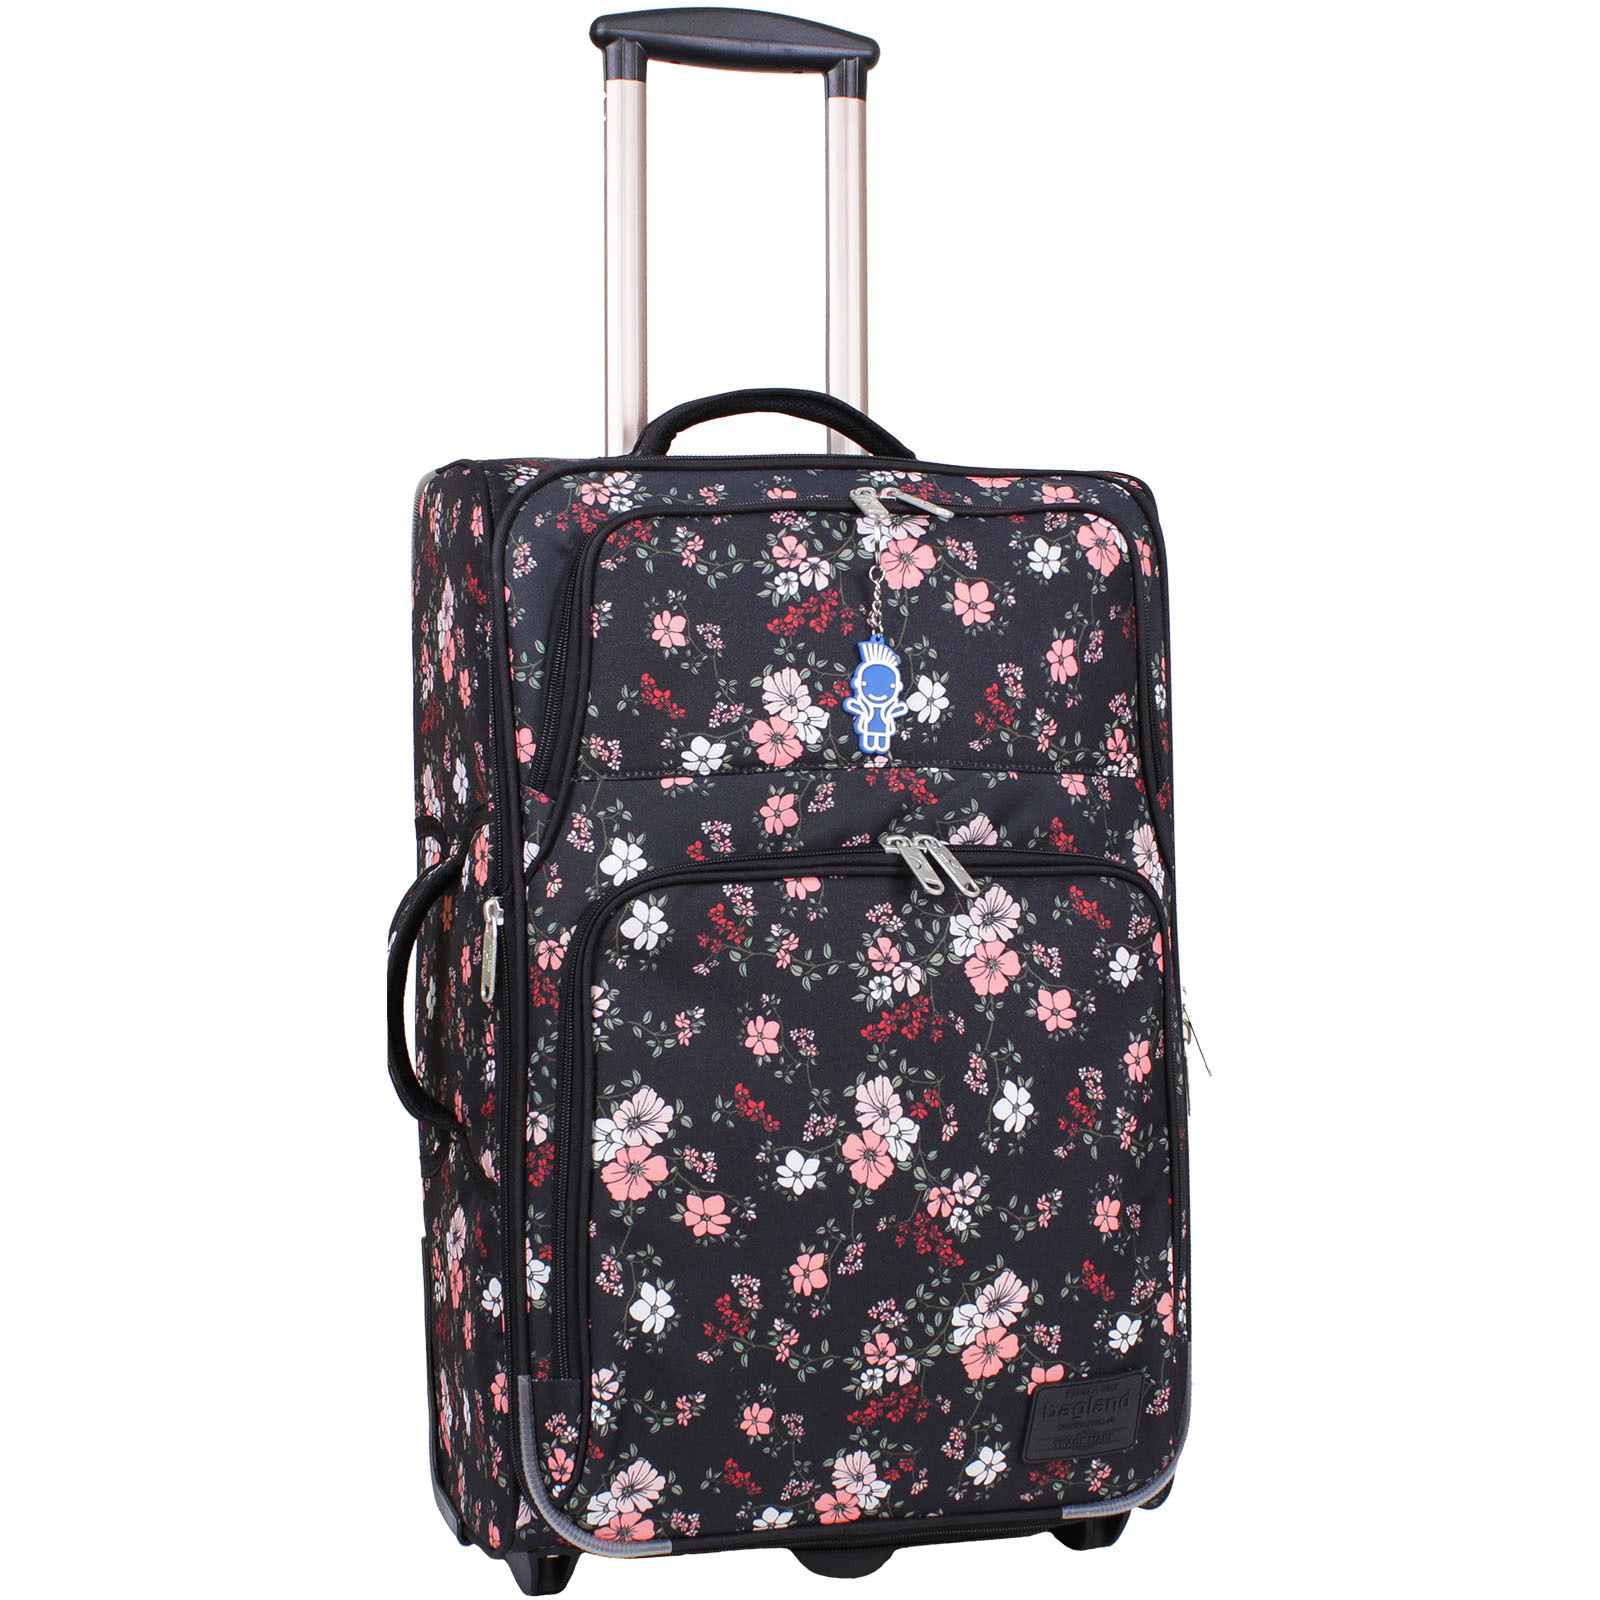 Дорожные чемоданы Чемодан Bagland Леон средний дизайн 51 л. сублімація 293 (0037666244) IMG_7902-1600.jpg